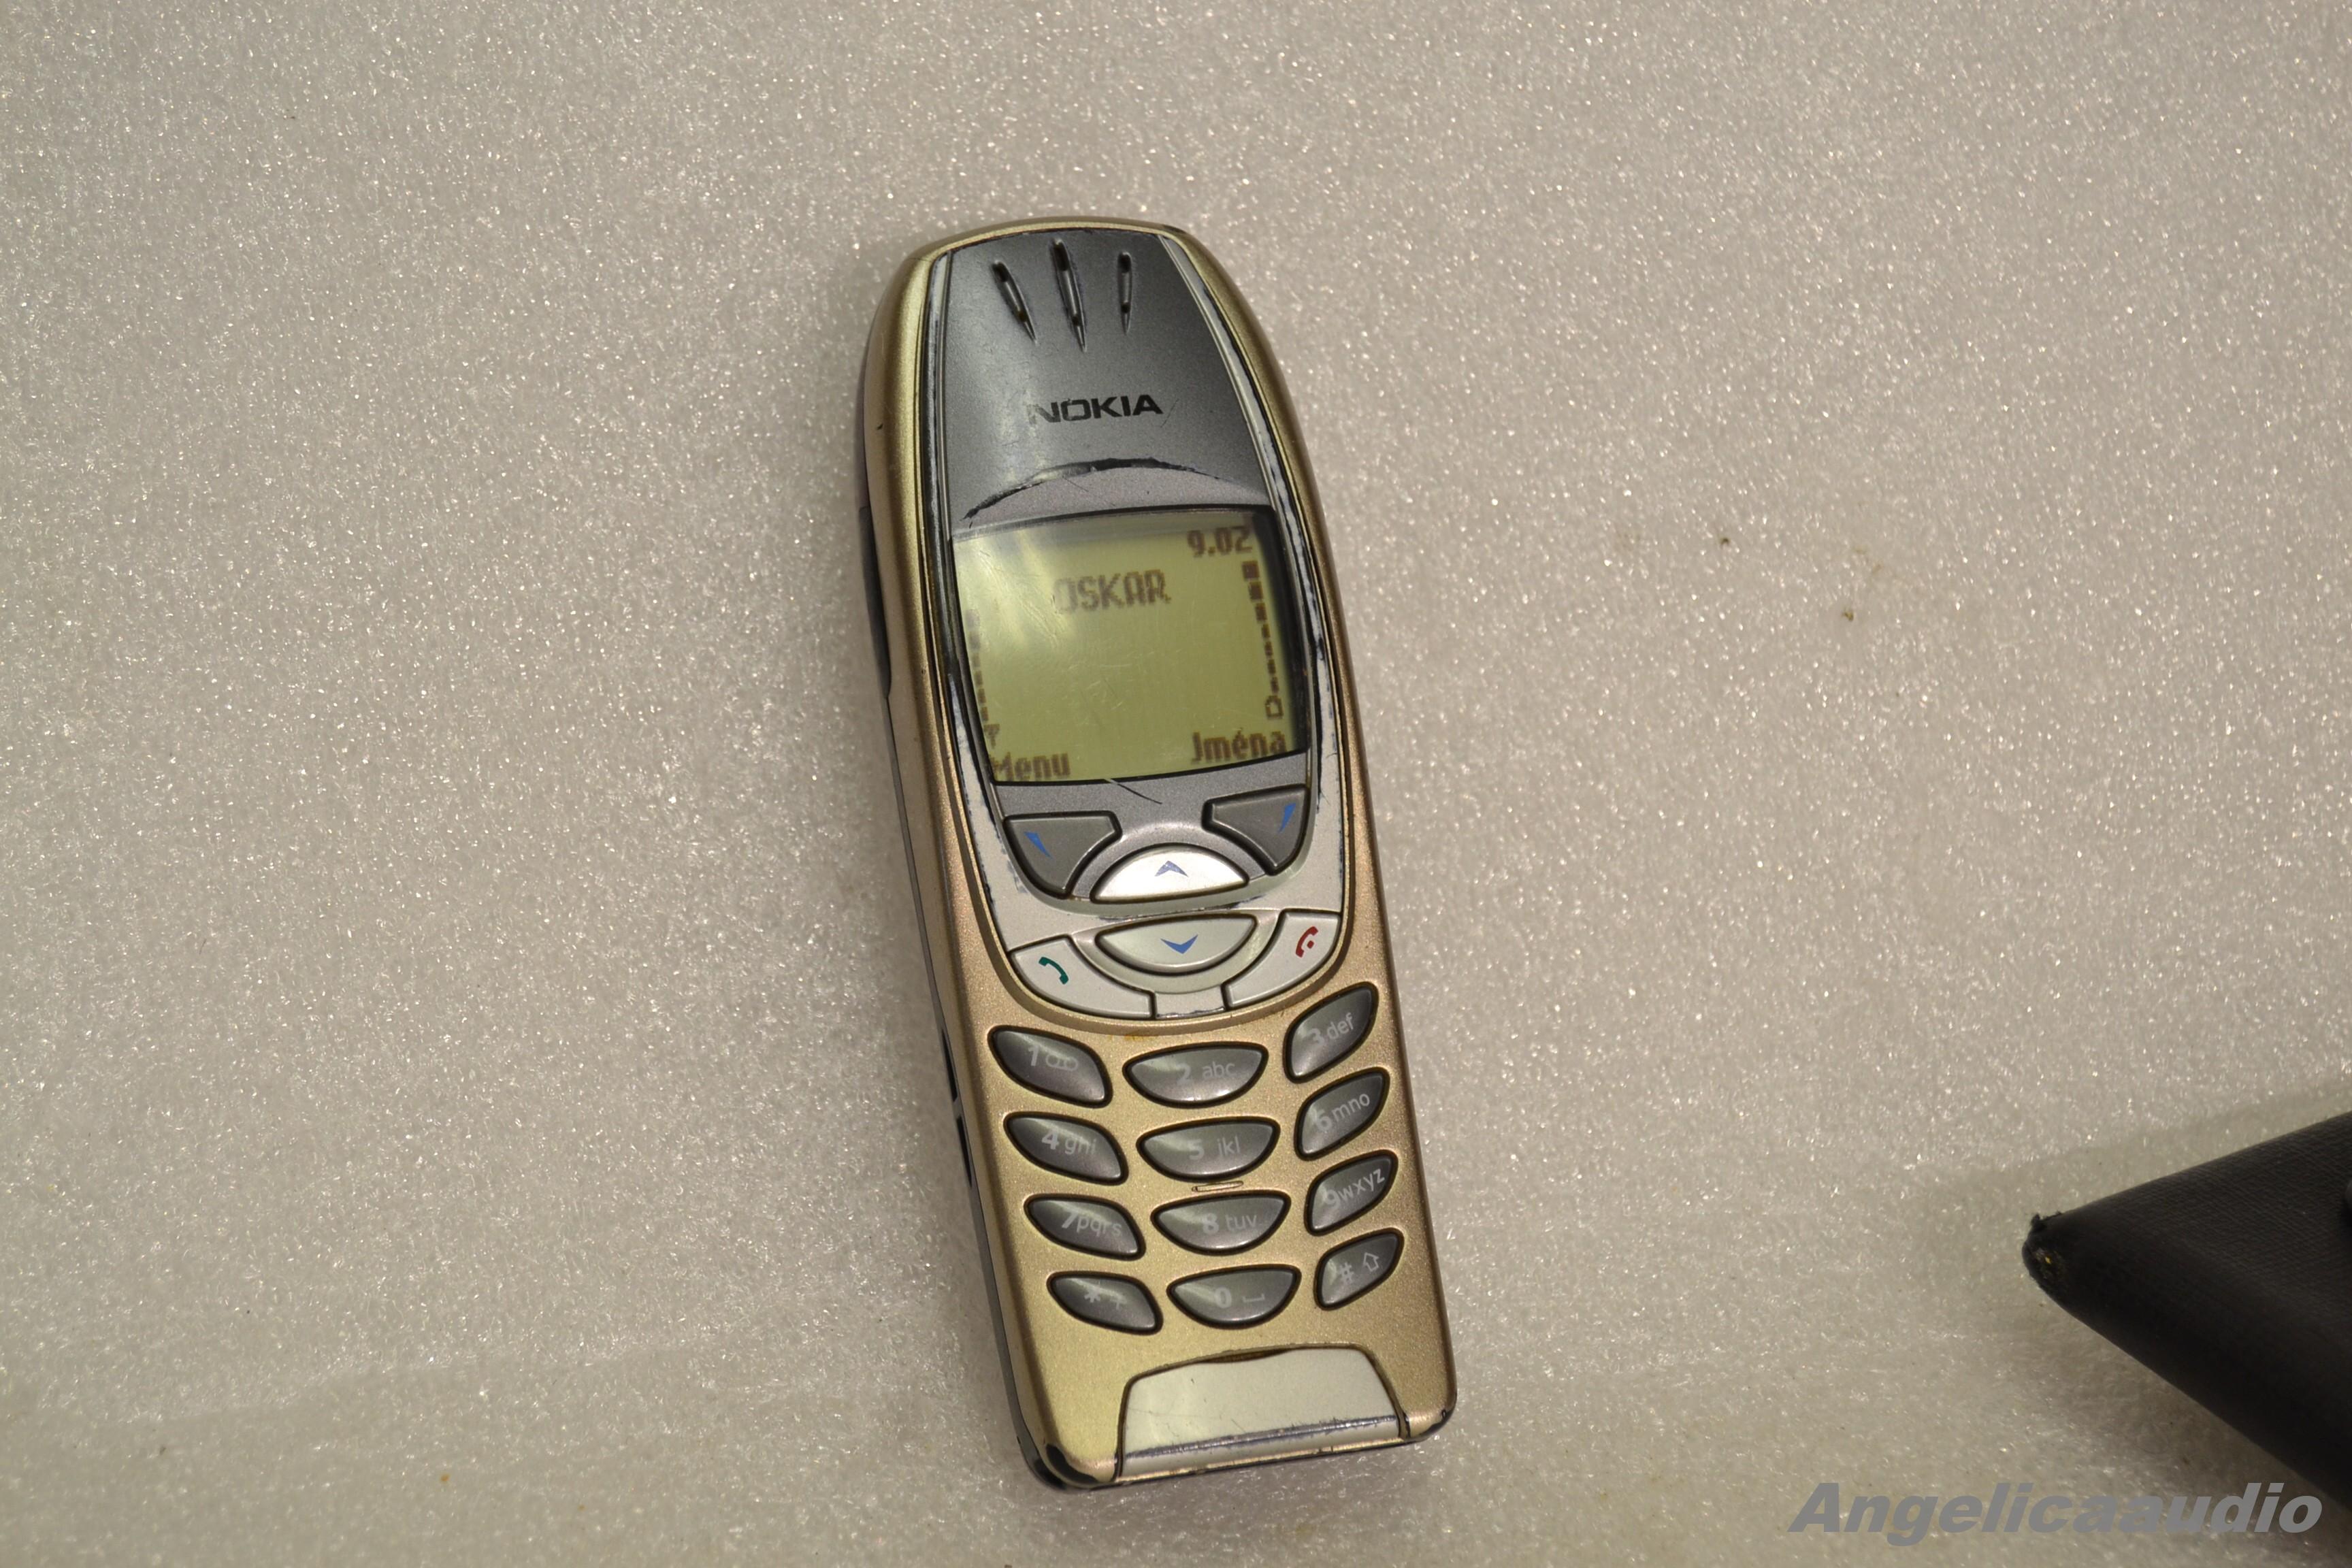 Nokia 6310i Telefon Angelicaaudio 1990